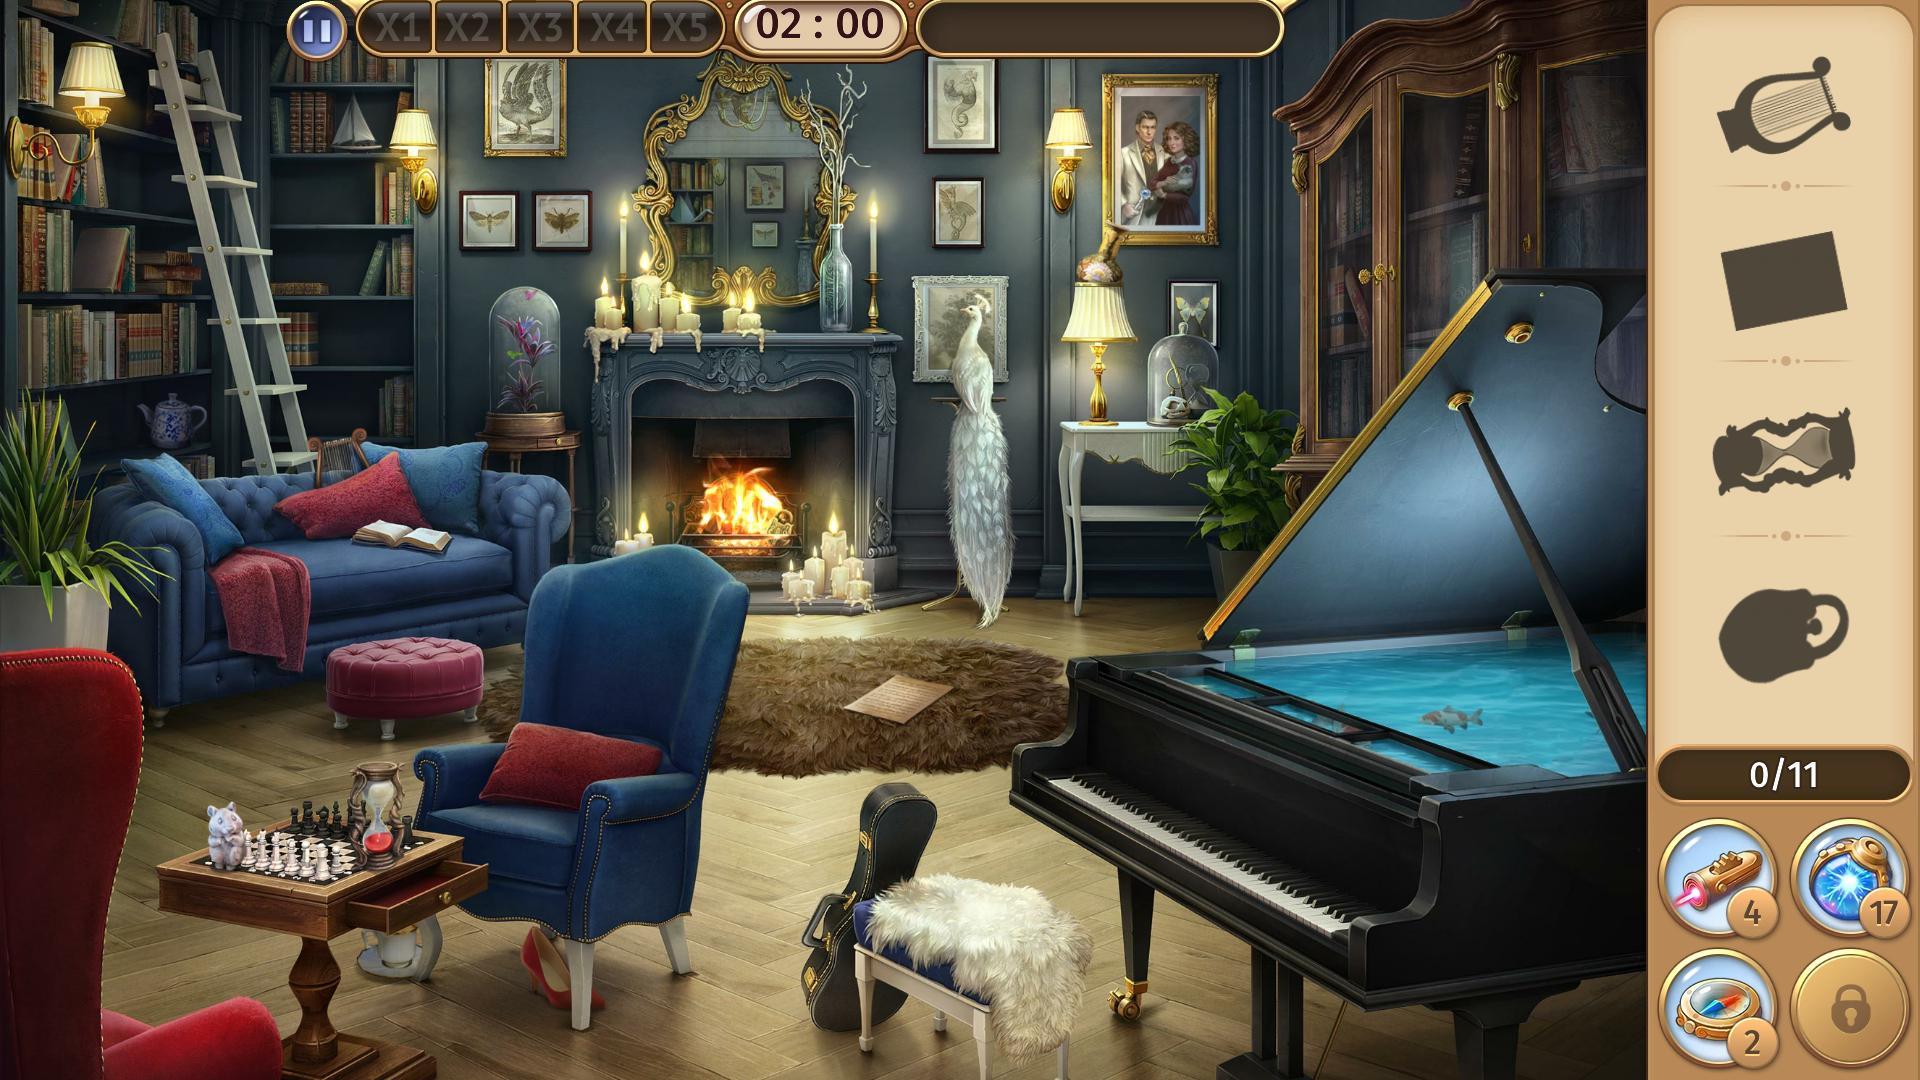 Mystery Manor: hidden objects 游戏截图5